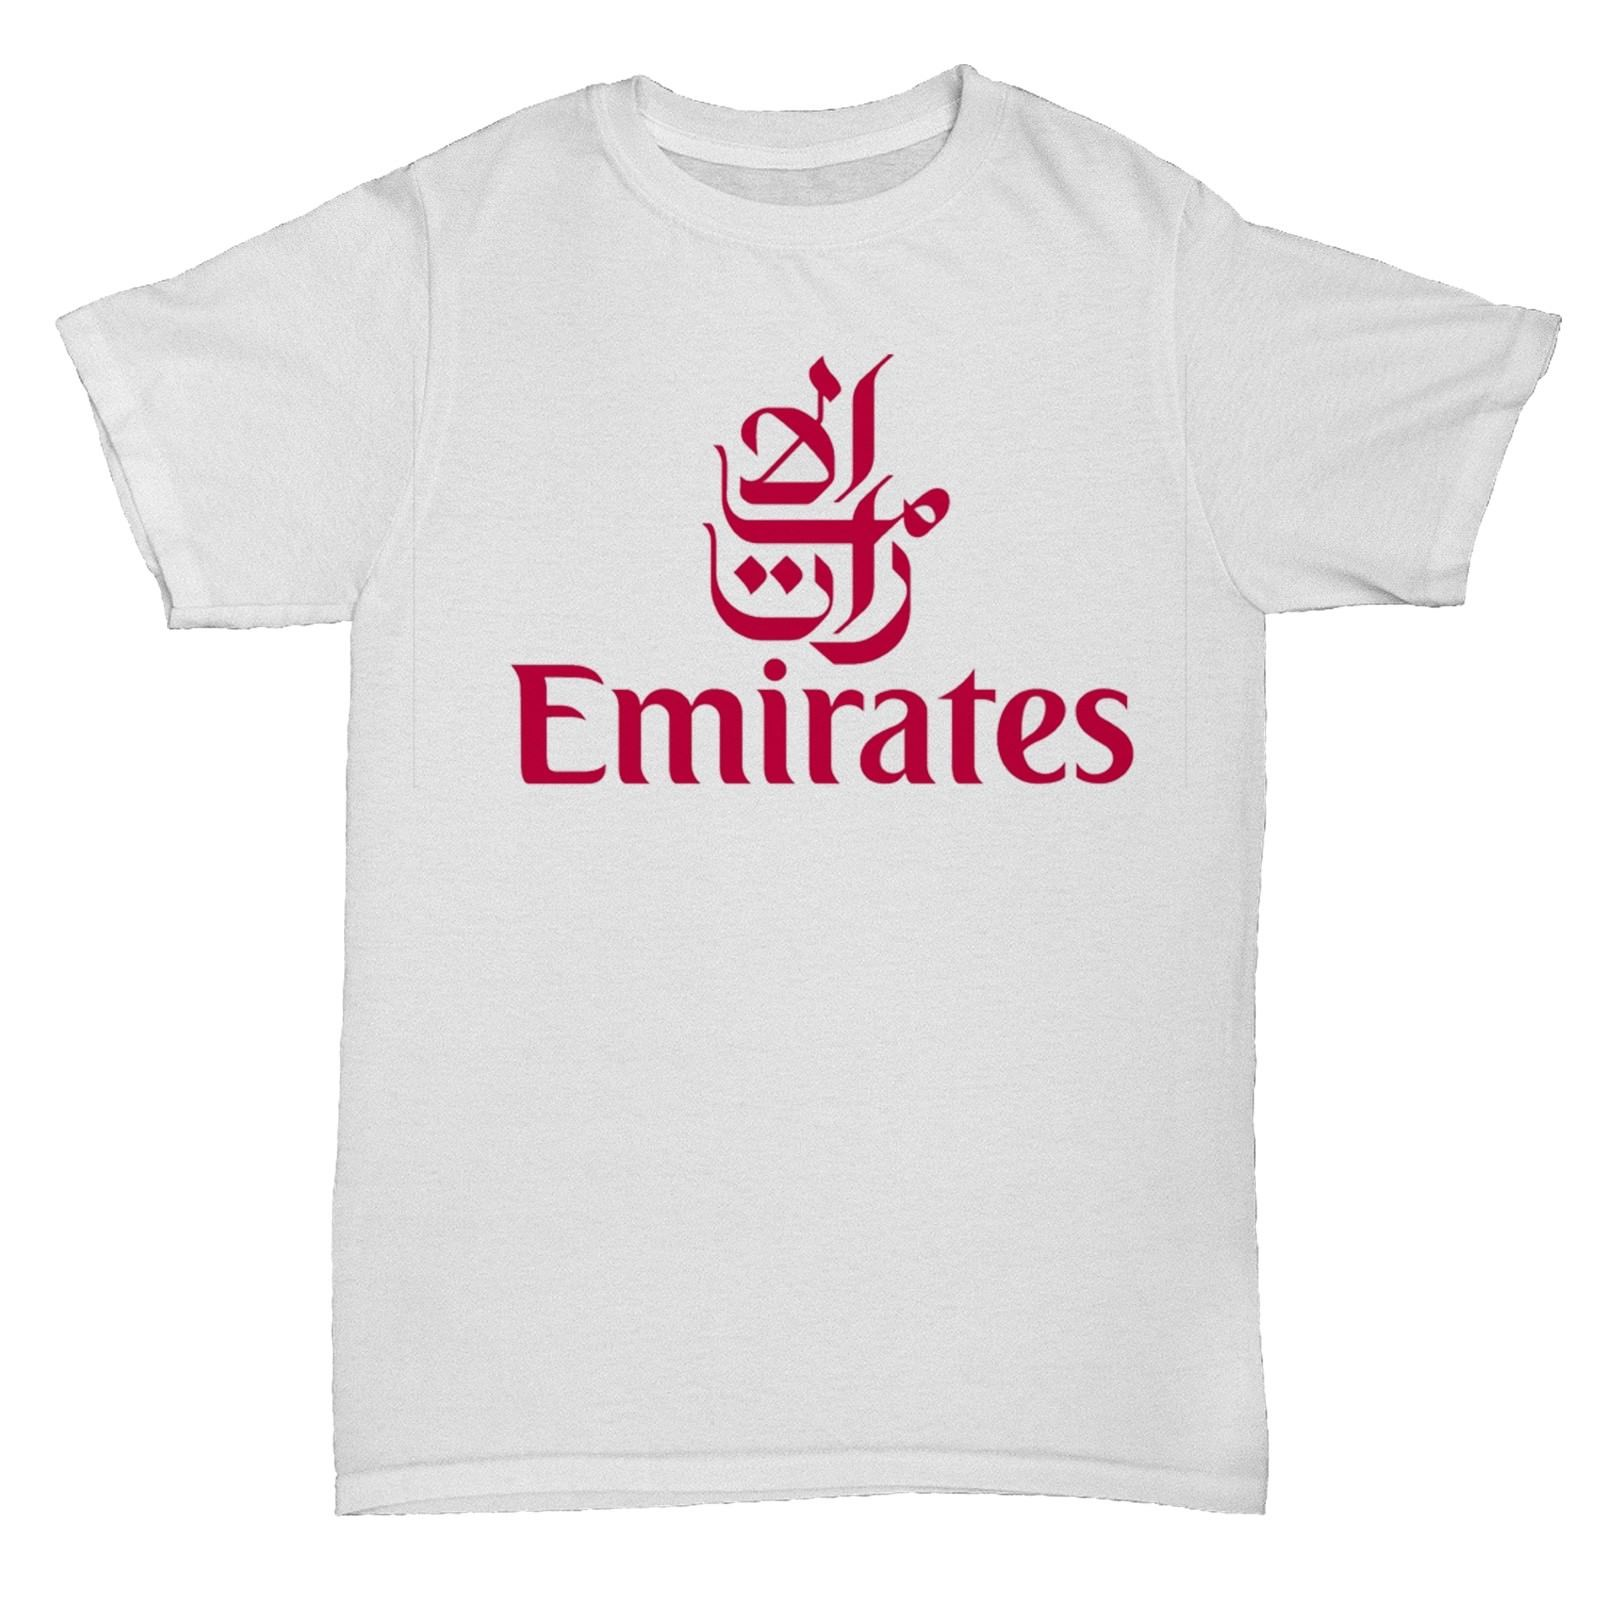 EMIRATES UAE AIRWAYS BA AIRLINES RETRO AEROPLANE BOAC PAN AM T SHIRT Print T-Shirt Men Summer Style Round Neck Clothes